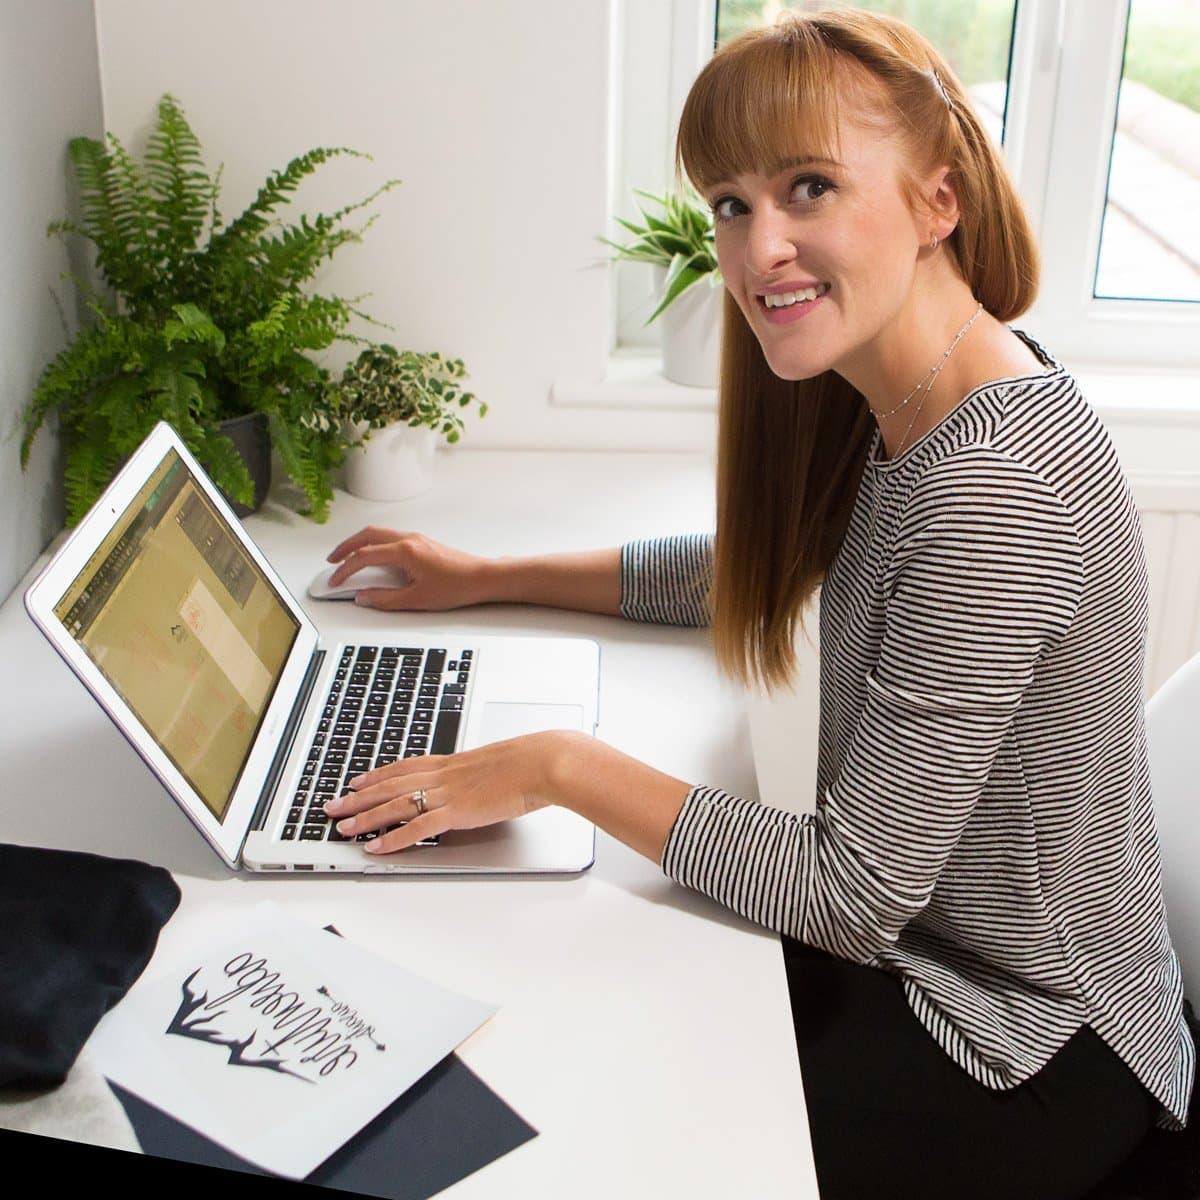 business woman in office on branding shoot